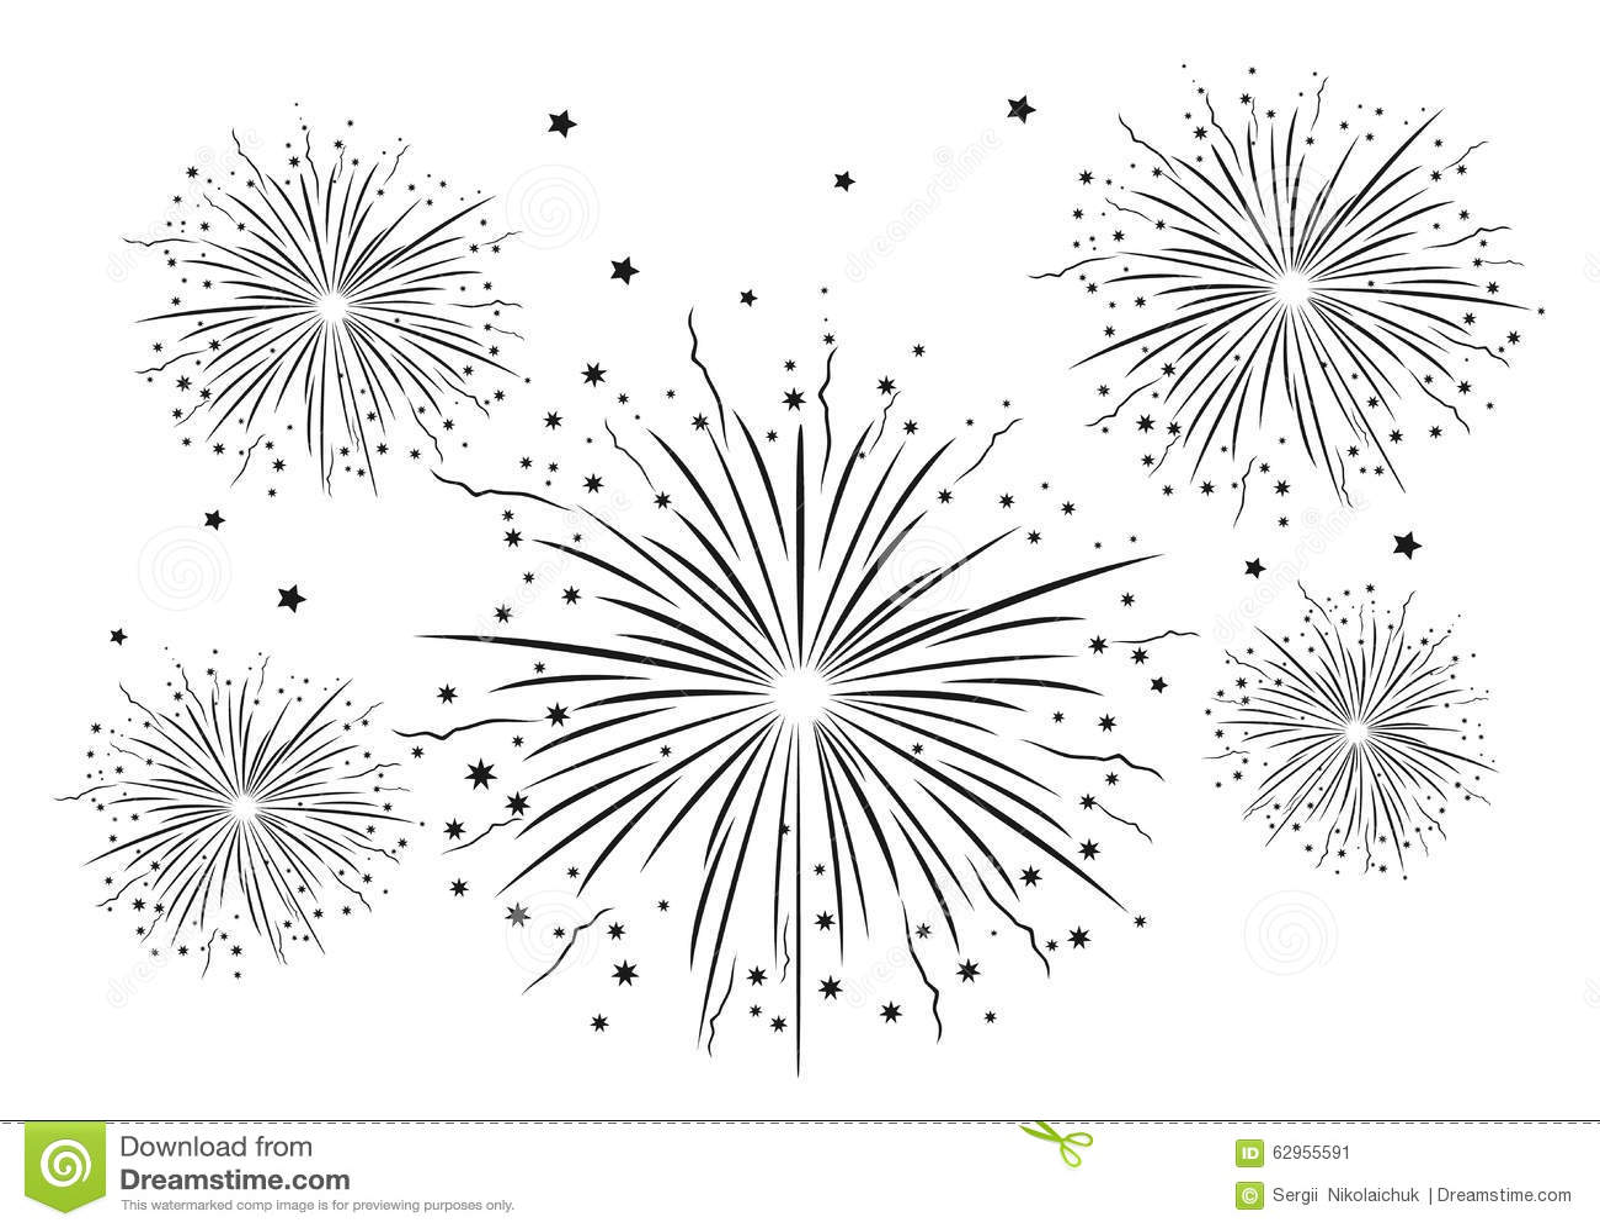 Fireworks Black And White . Stock Illustration - Image ...